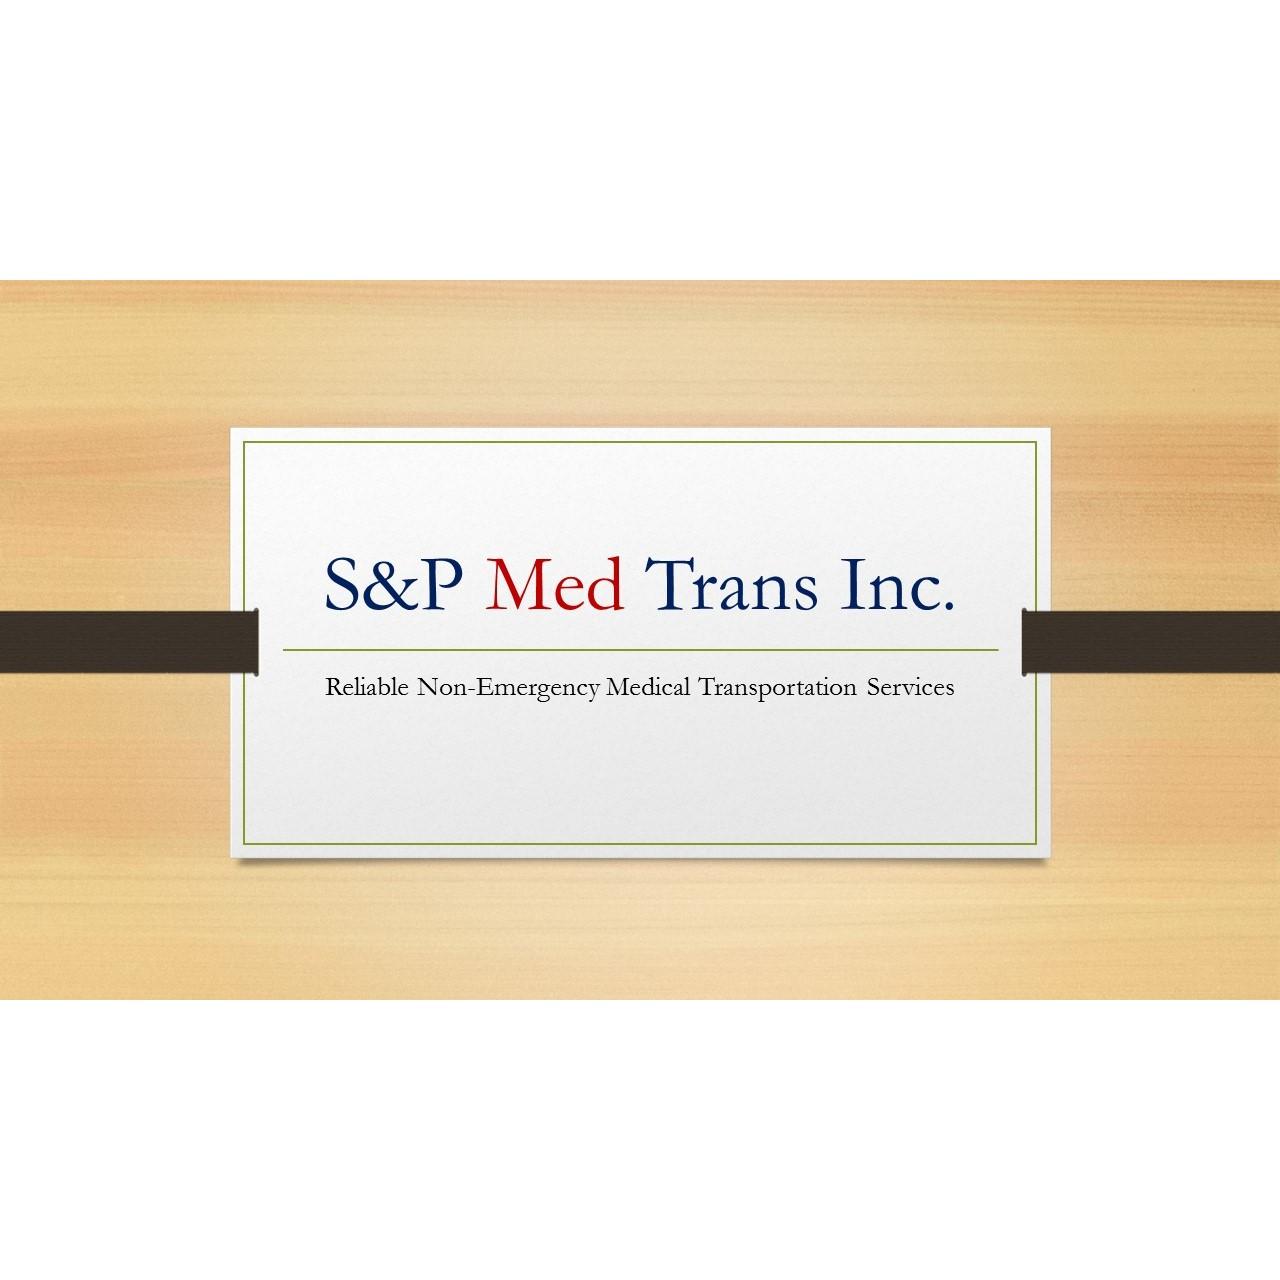 S&P Med Trans Inc. image 1